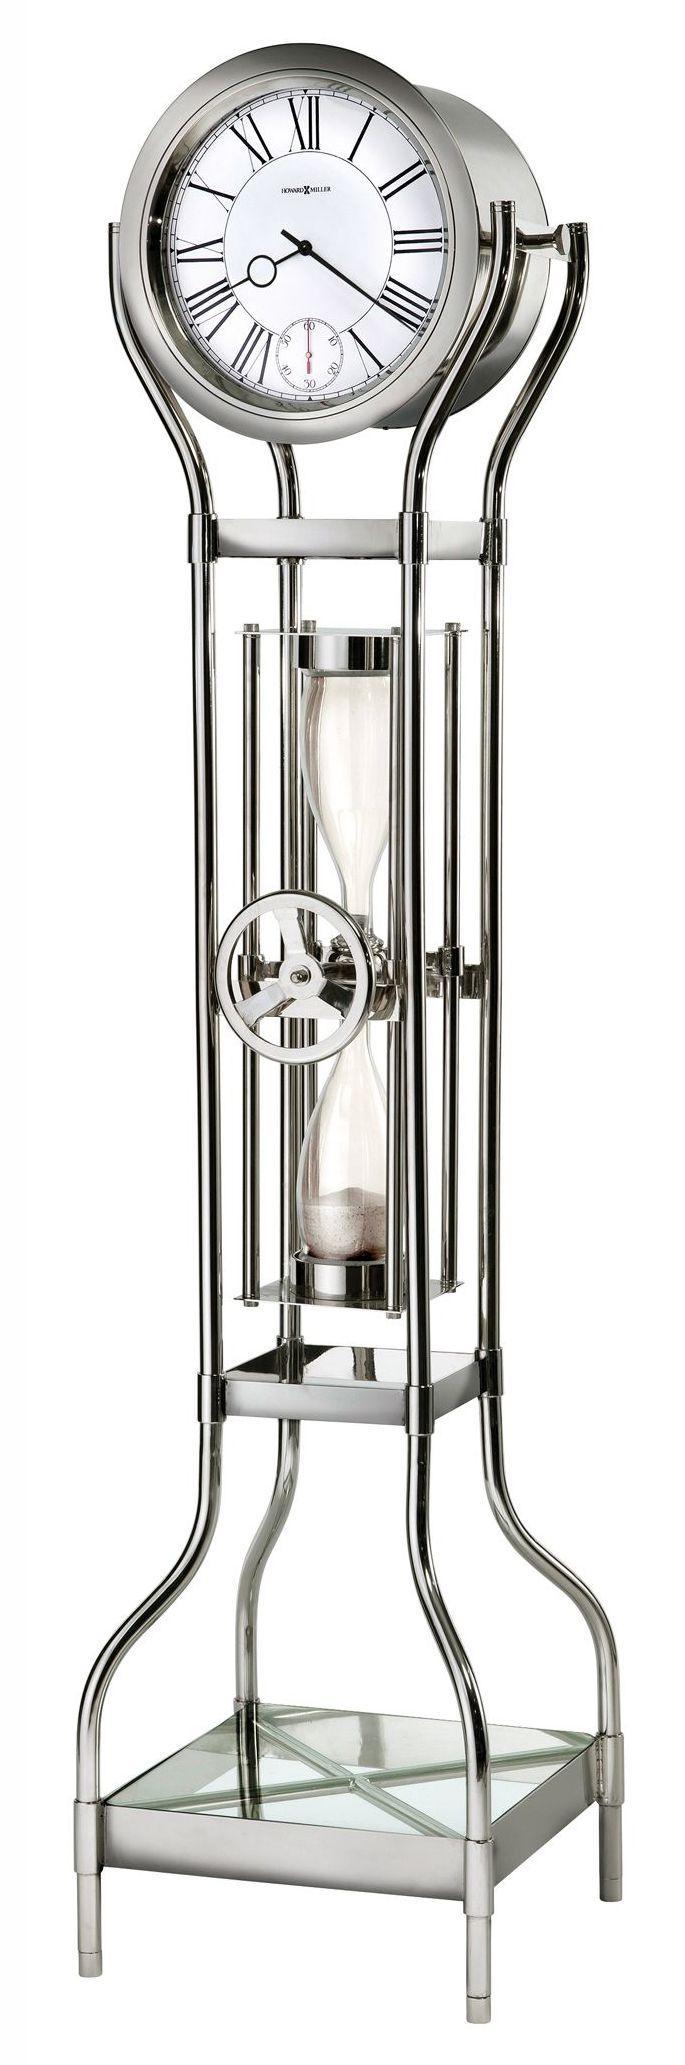 Howard Miller 615-100 Hourglass II  (Аургласс II) - фото 1